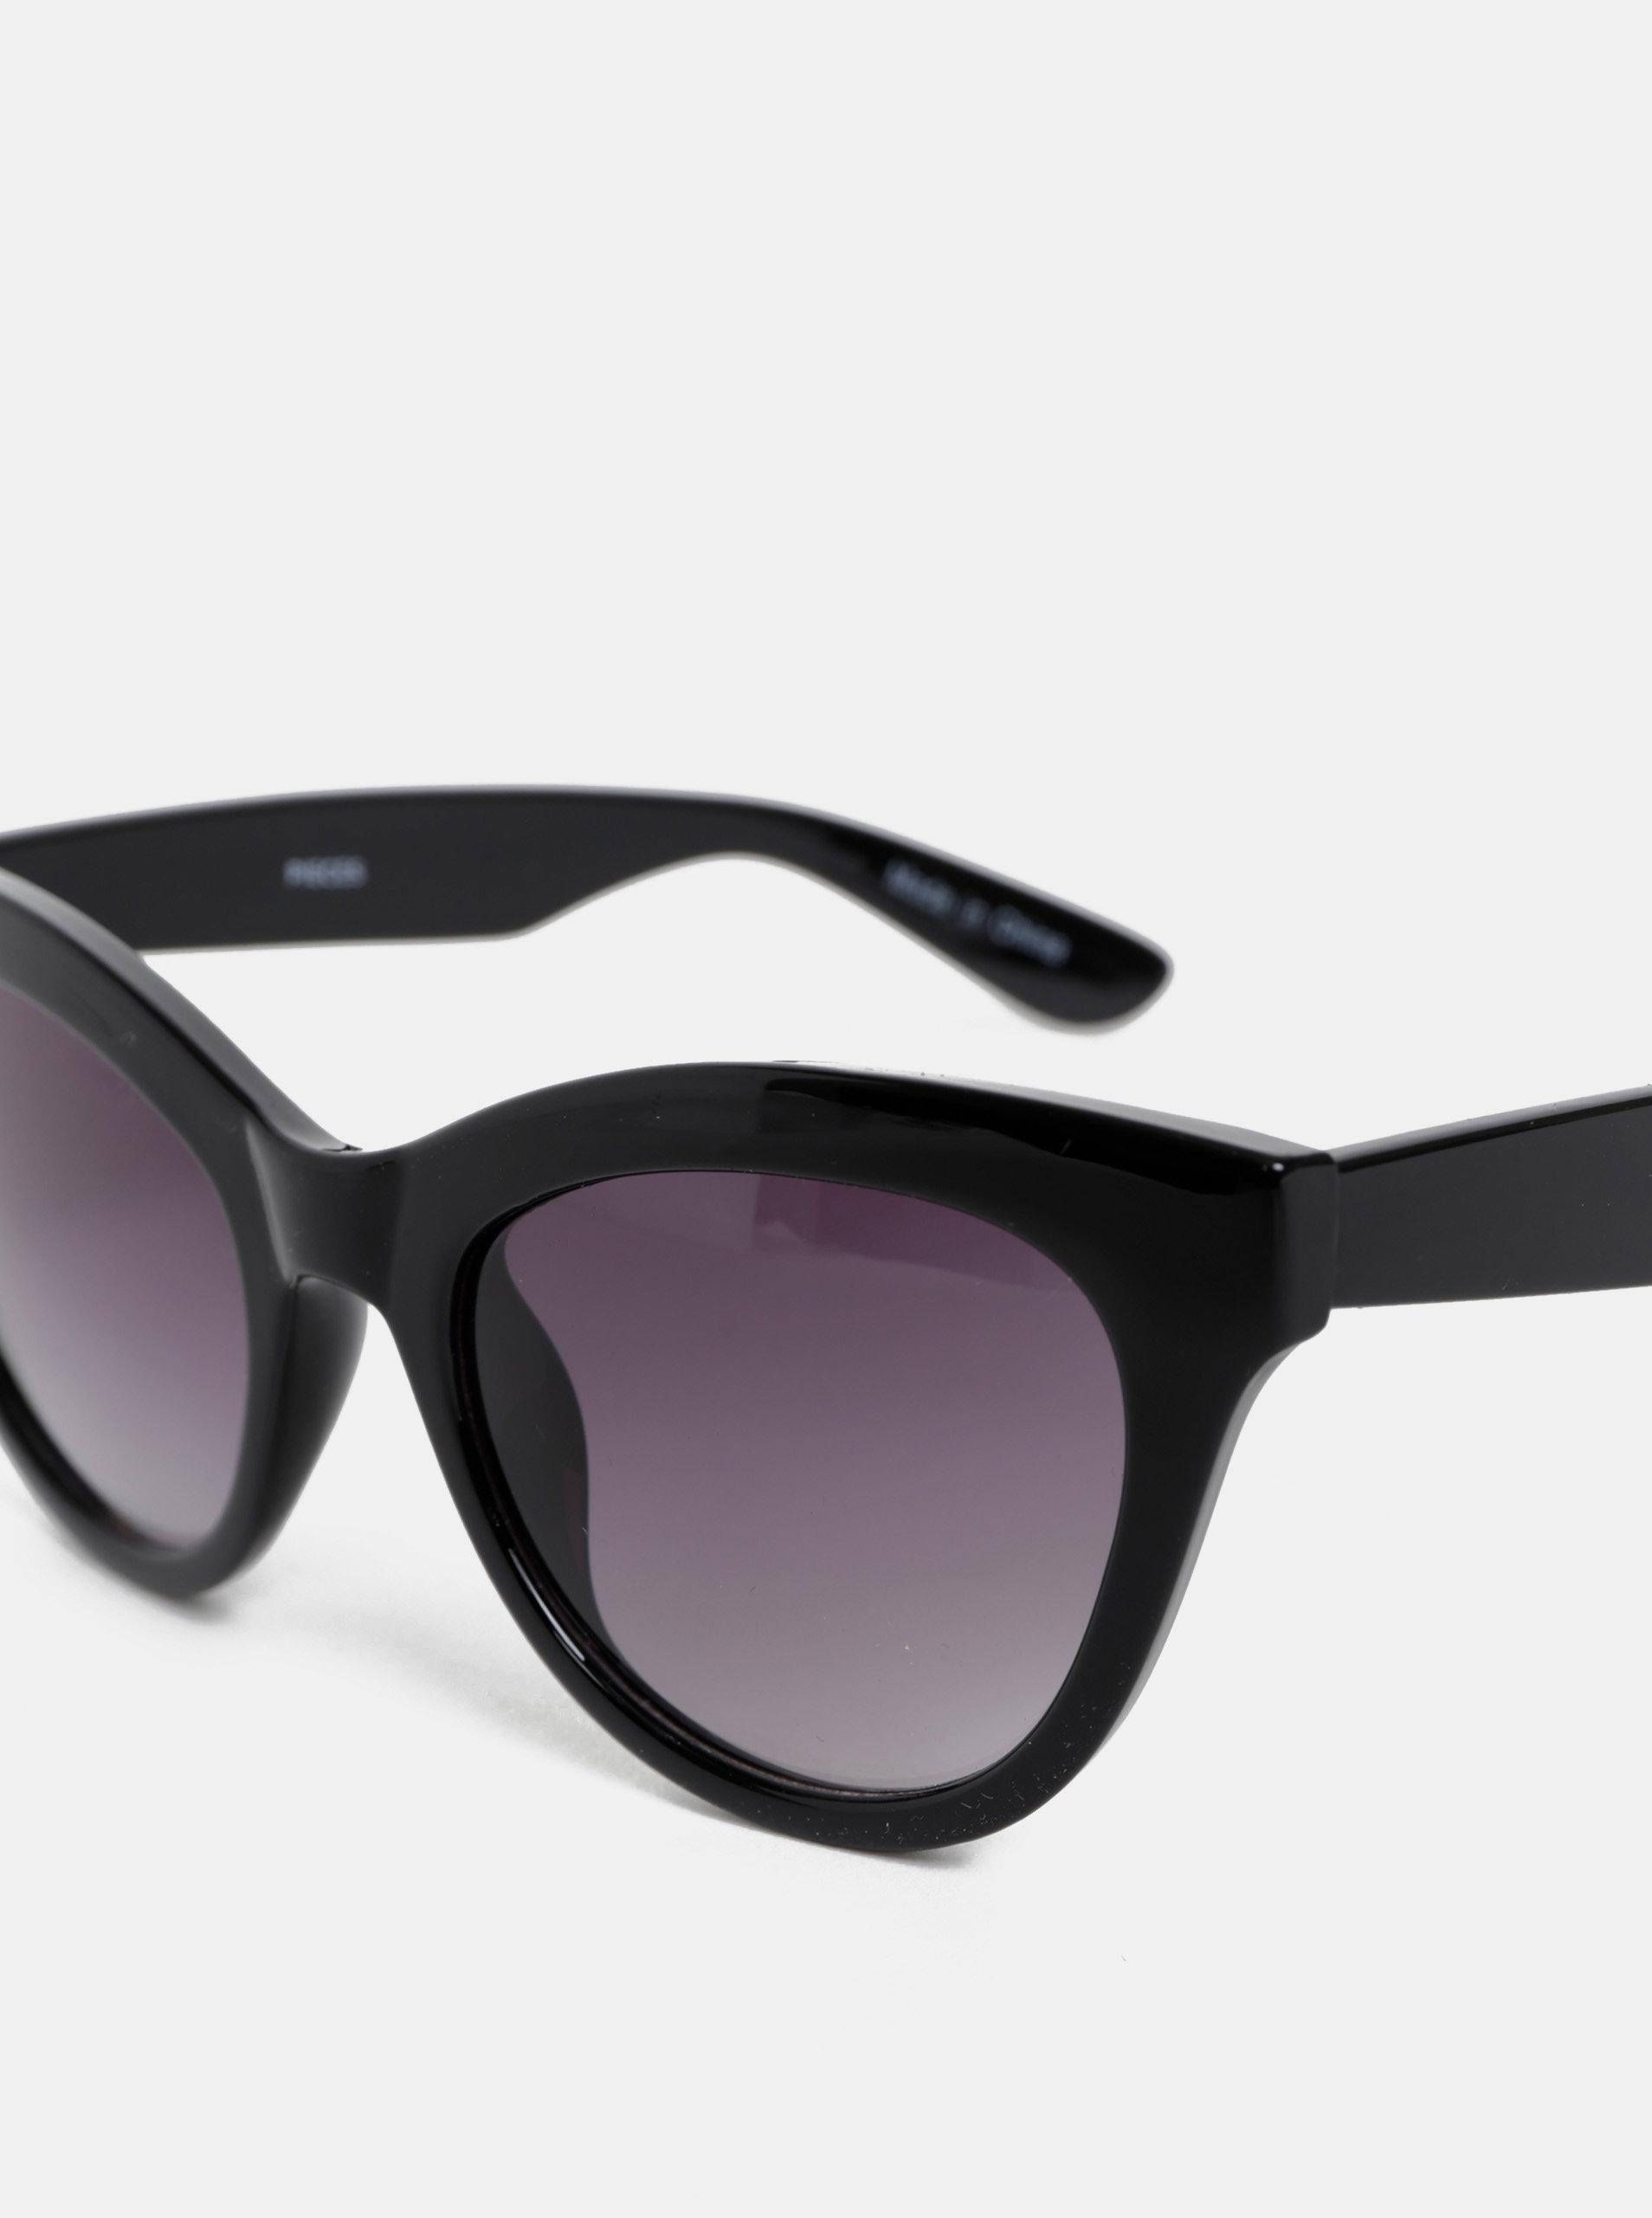 8d2a962f1 Čierne slnečné okuliare Pieces Betty | ZOOT.sk